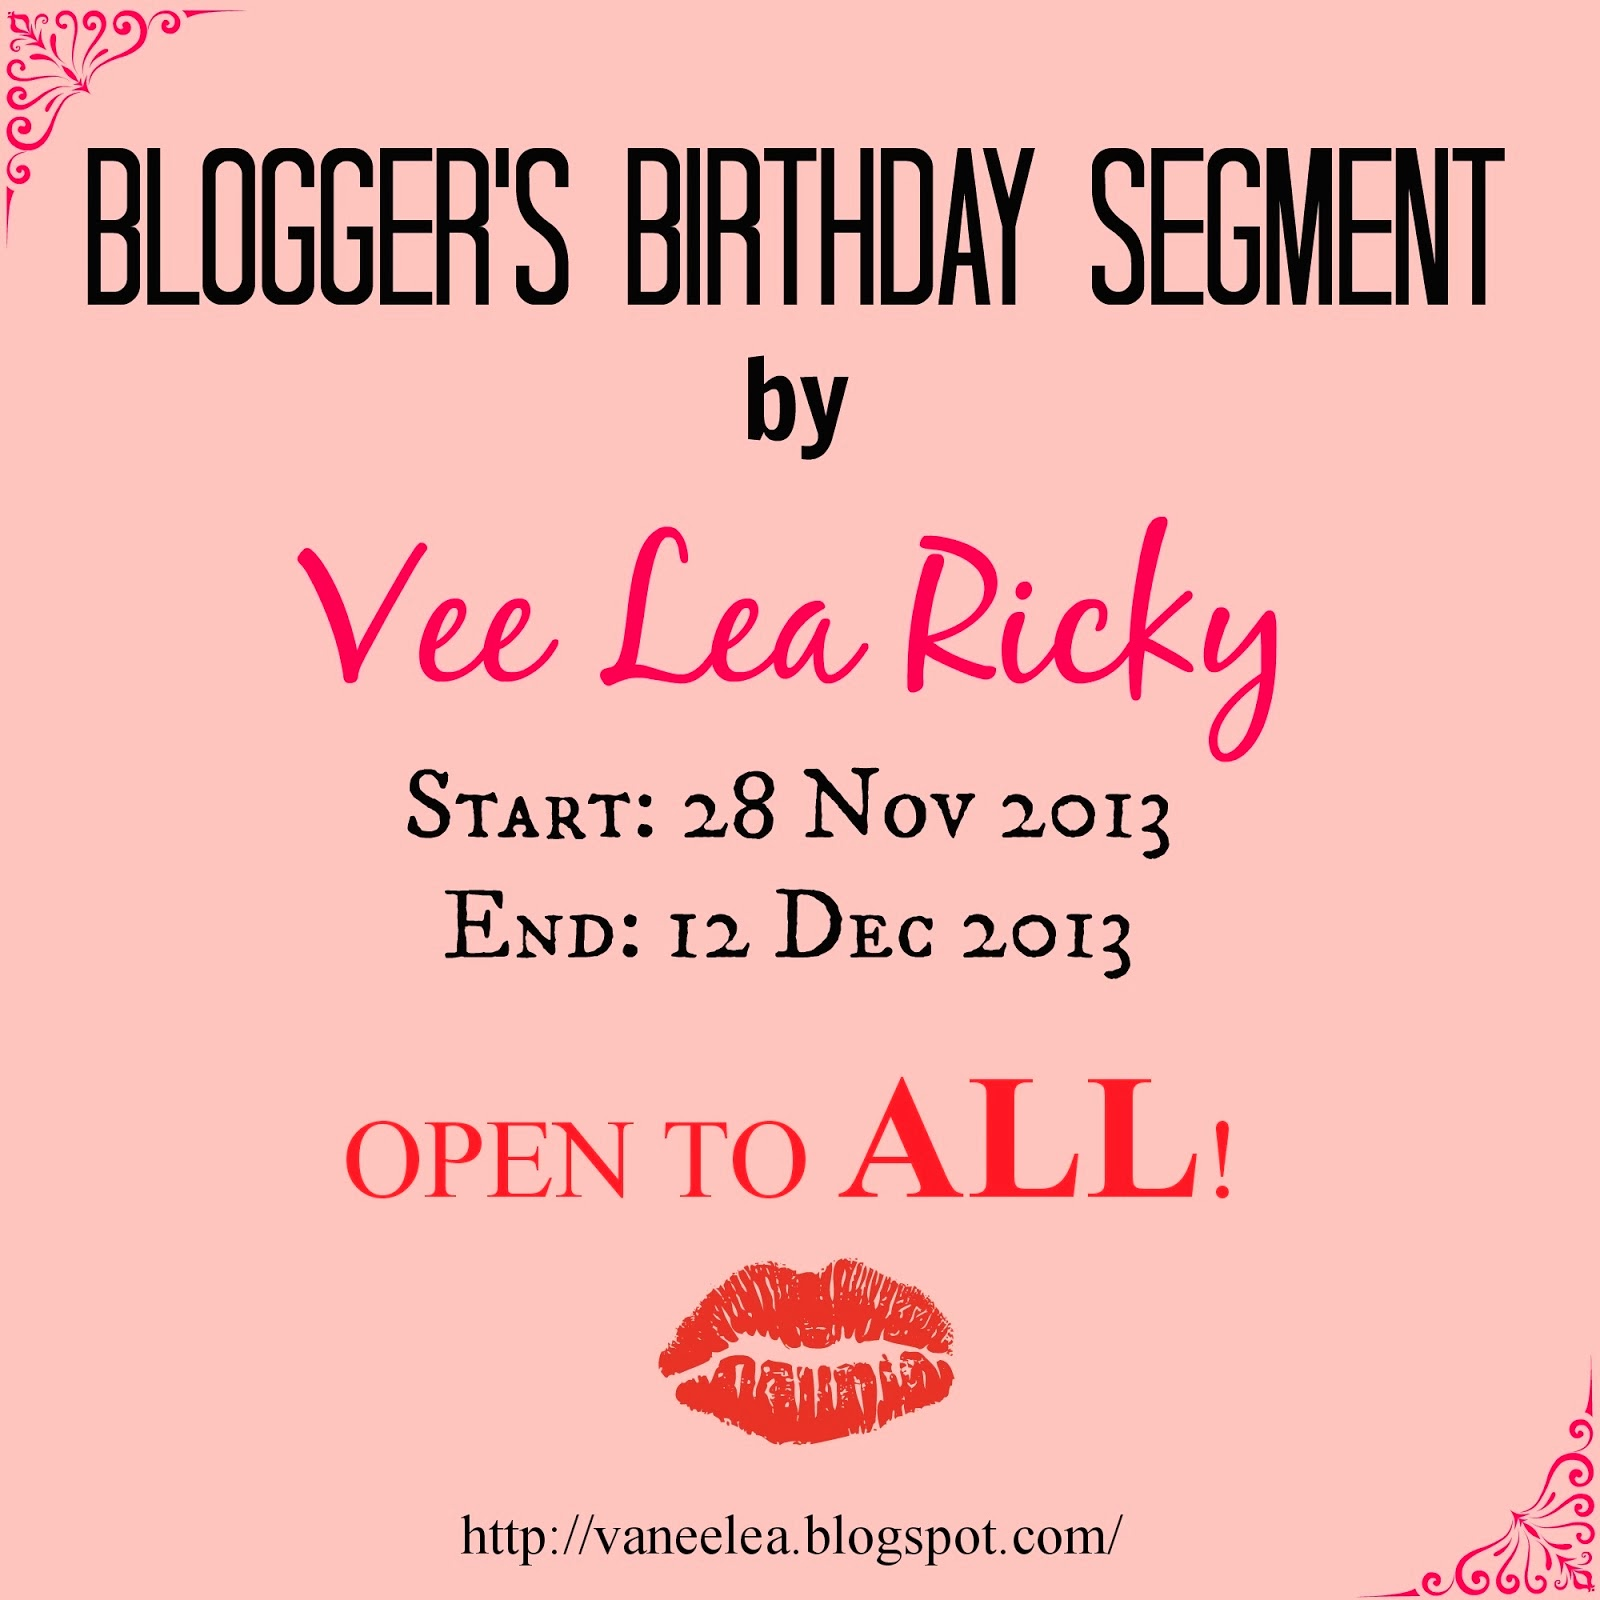 http://vaneelea.blogspot.com/2013/11/bloggers-birthday-segment.html